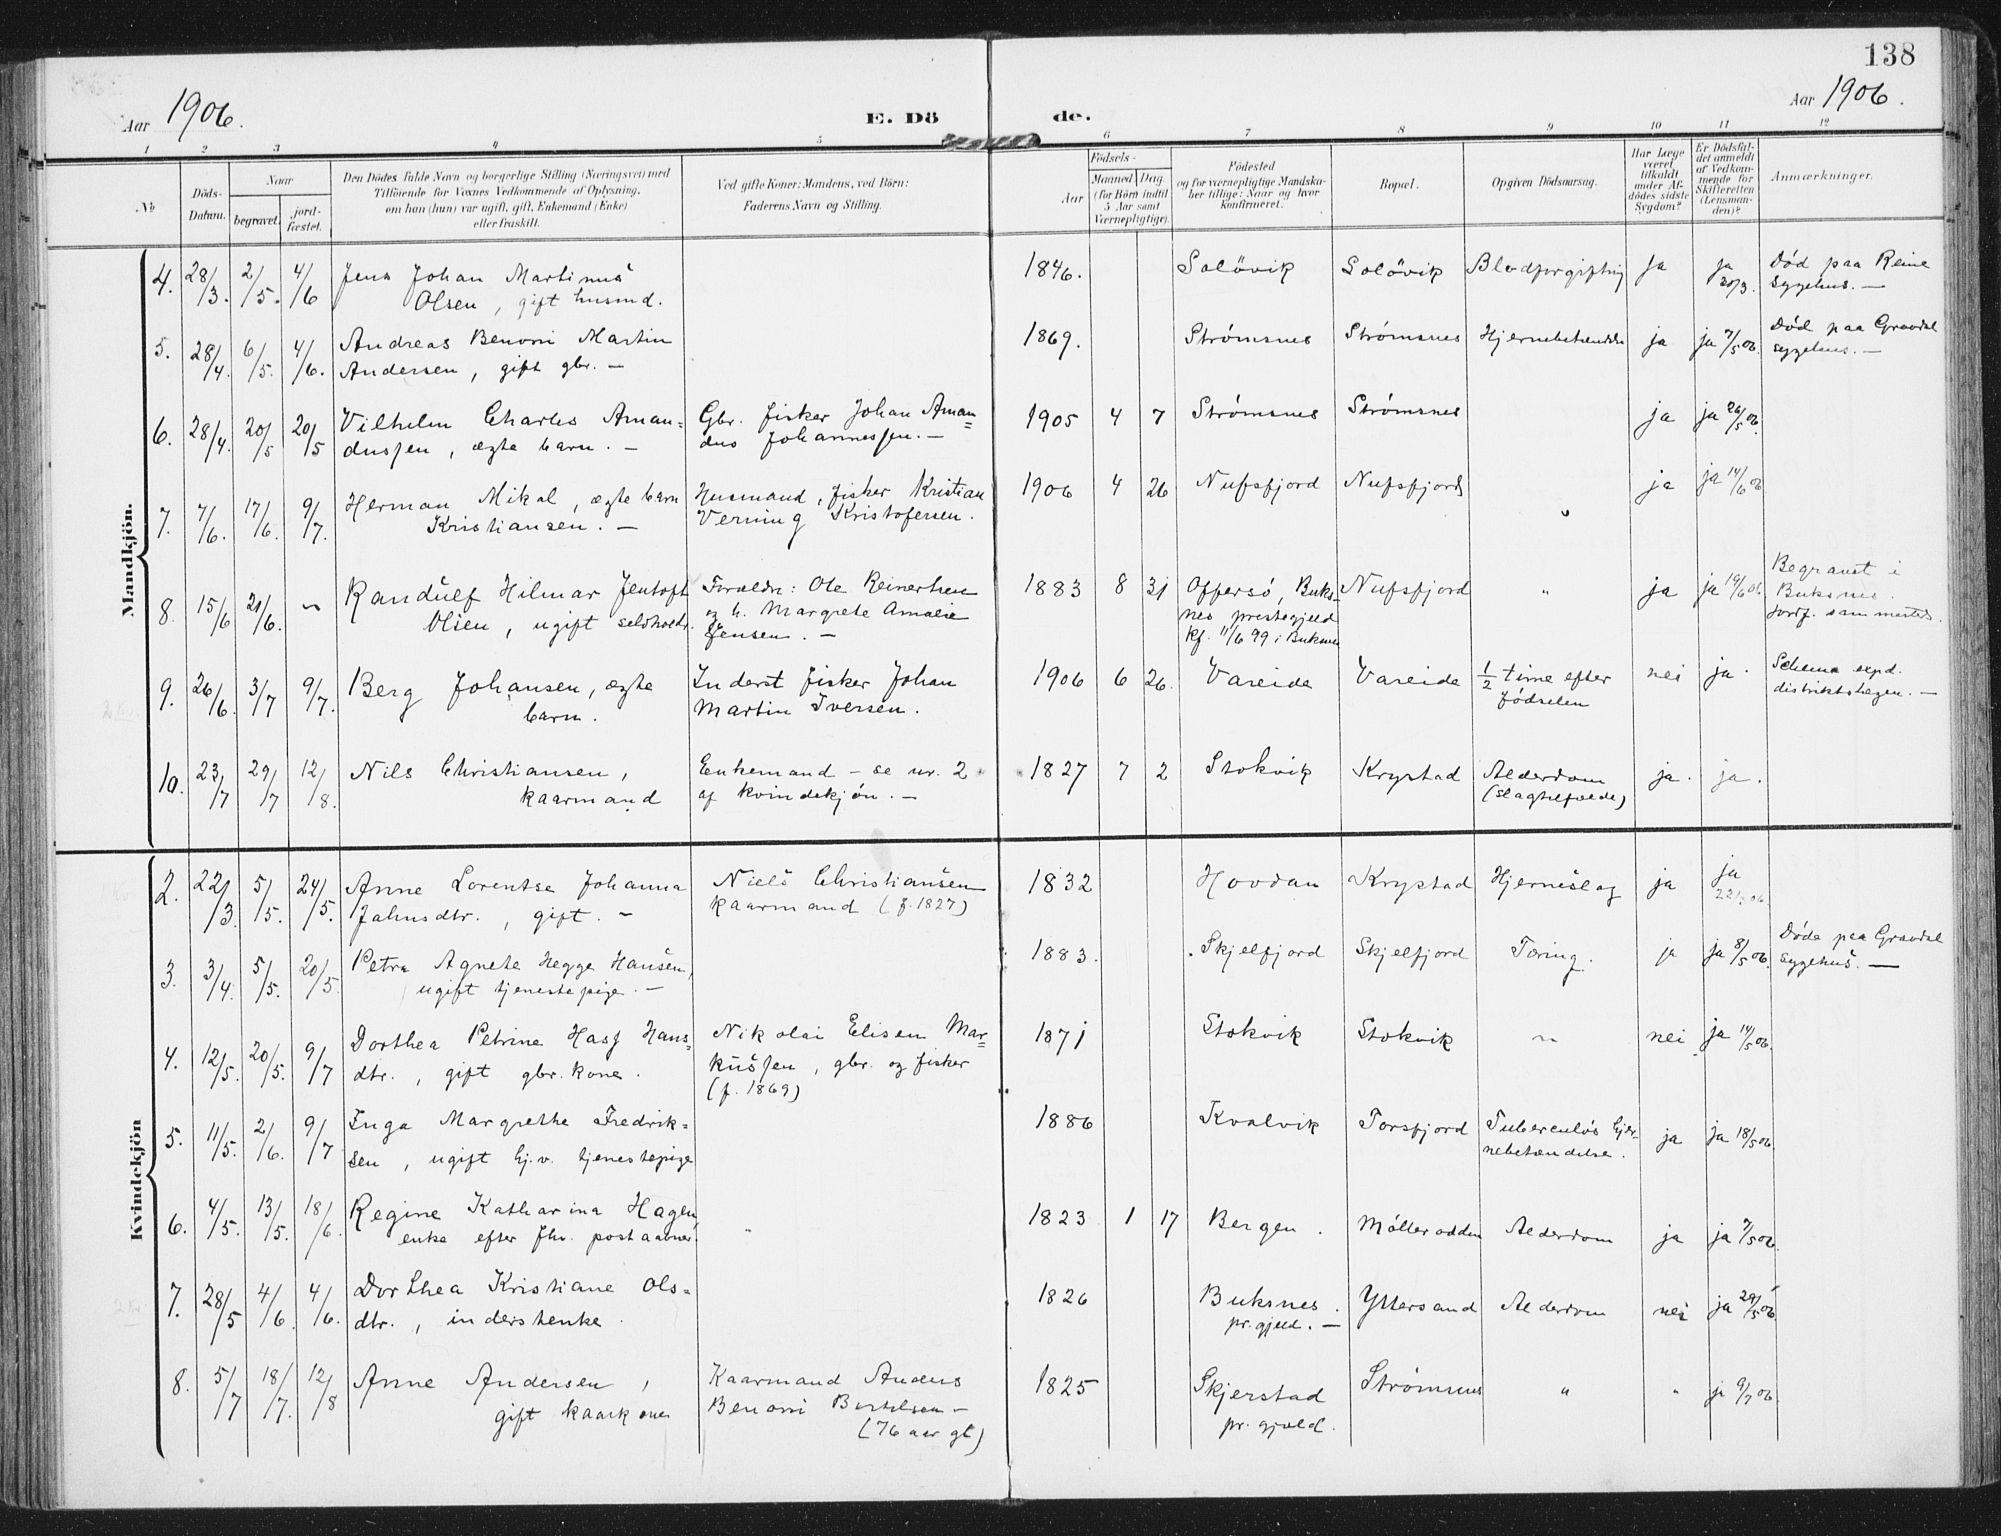 SAT, Ministerialprotokoller, klokkerbøker og fødselsregistre - Nordland, 885/L1206: Ministerialbok nr. 885A07, 1905-1915, s. 138